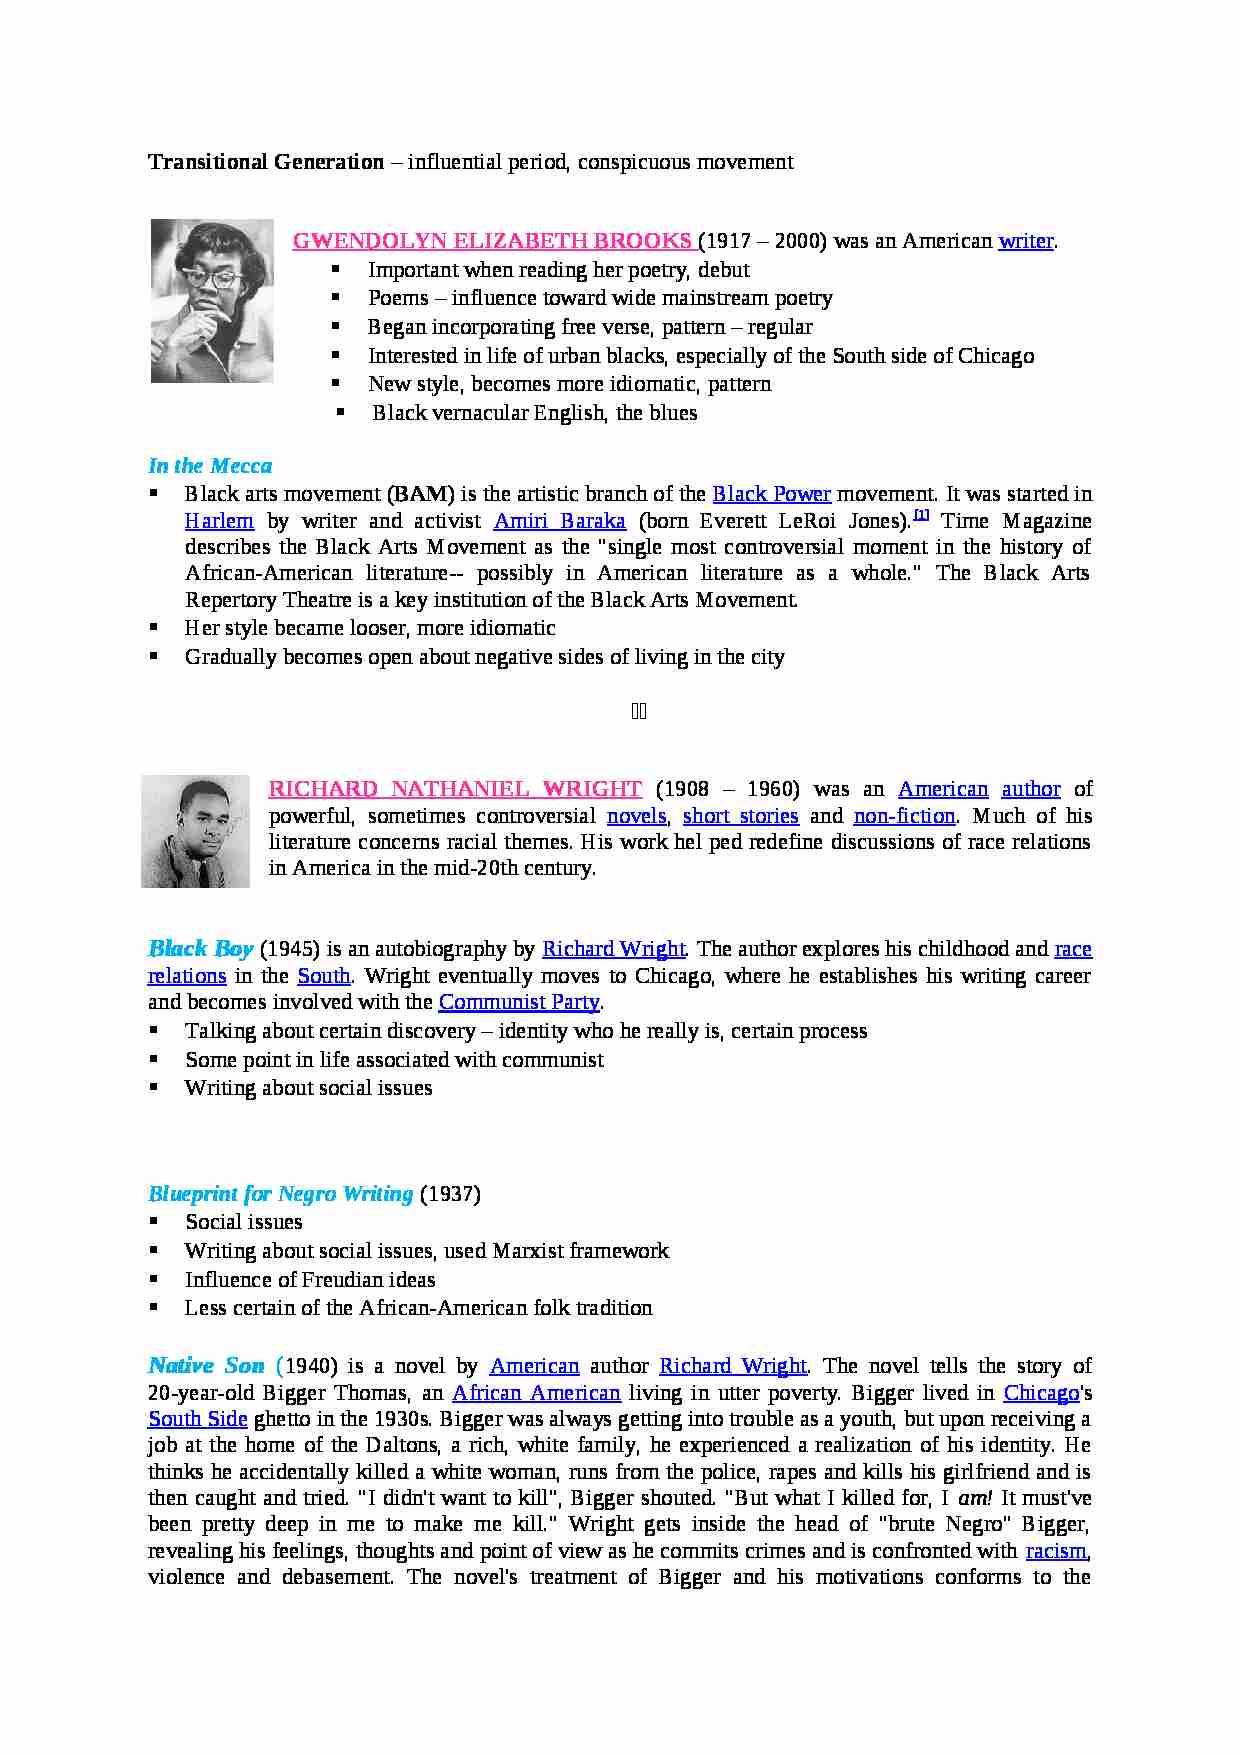 Transitional generation opracowanie notatek podgld dokumentu transitional generation opracowanie strona 1 malvernweather Image collections